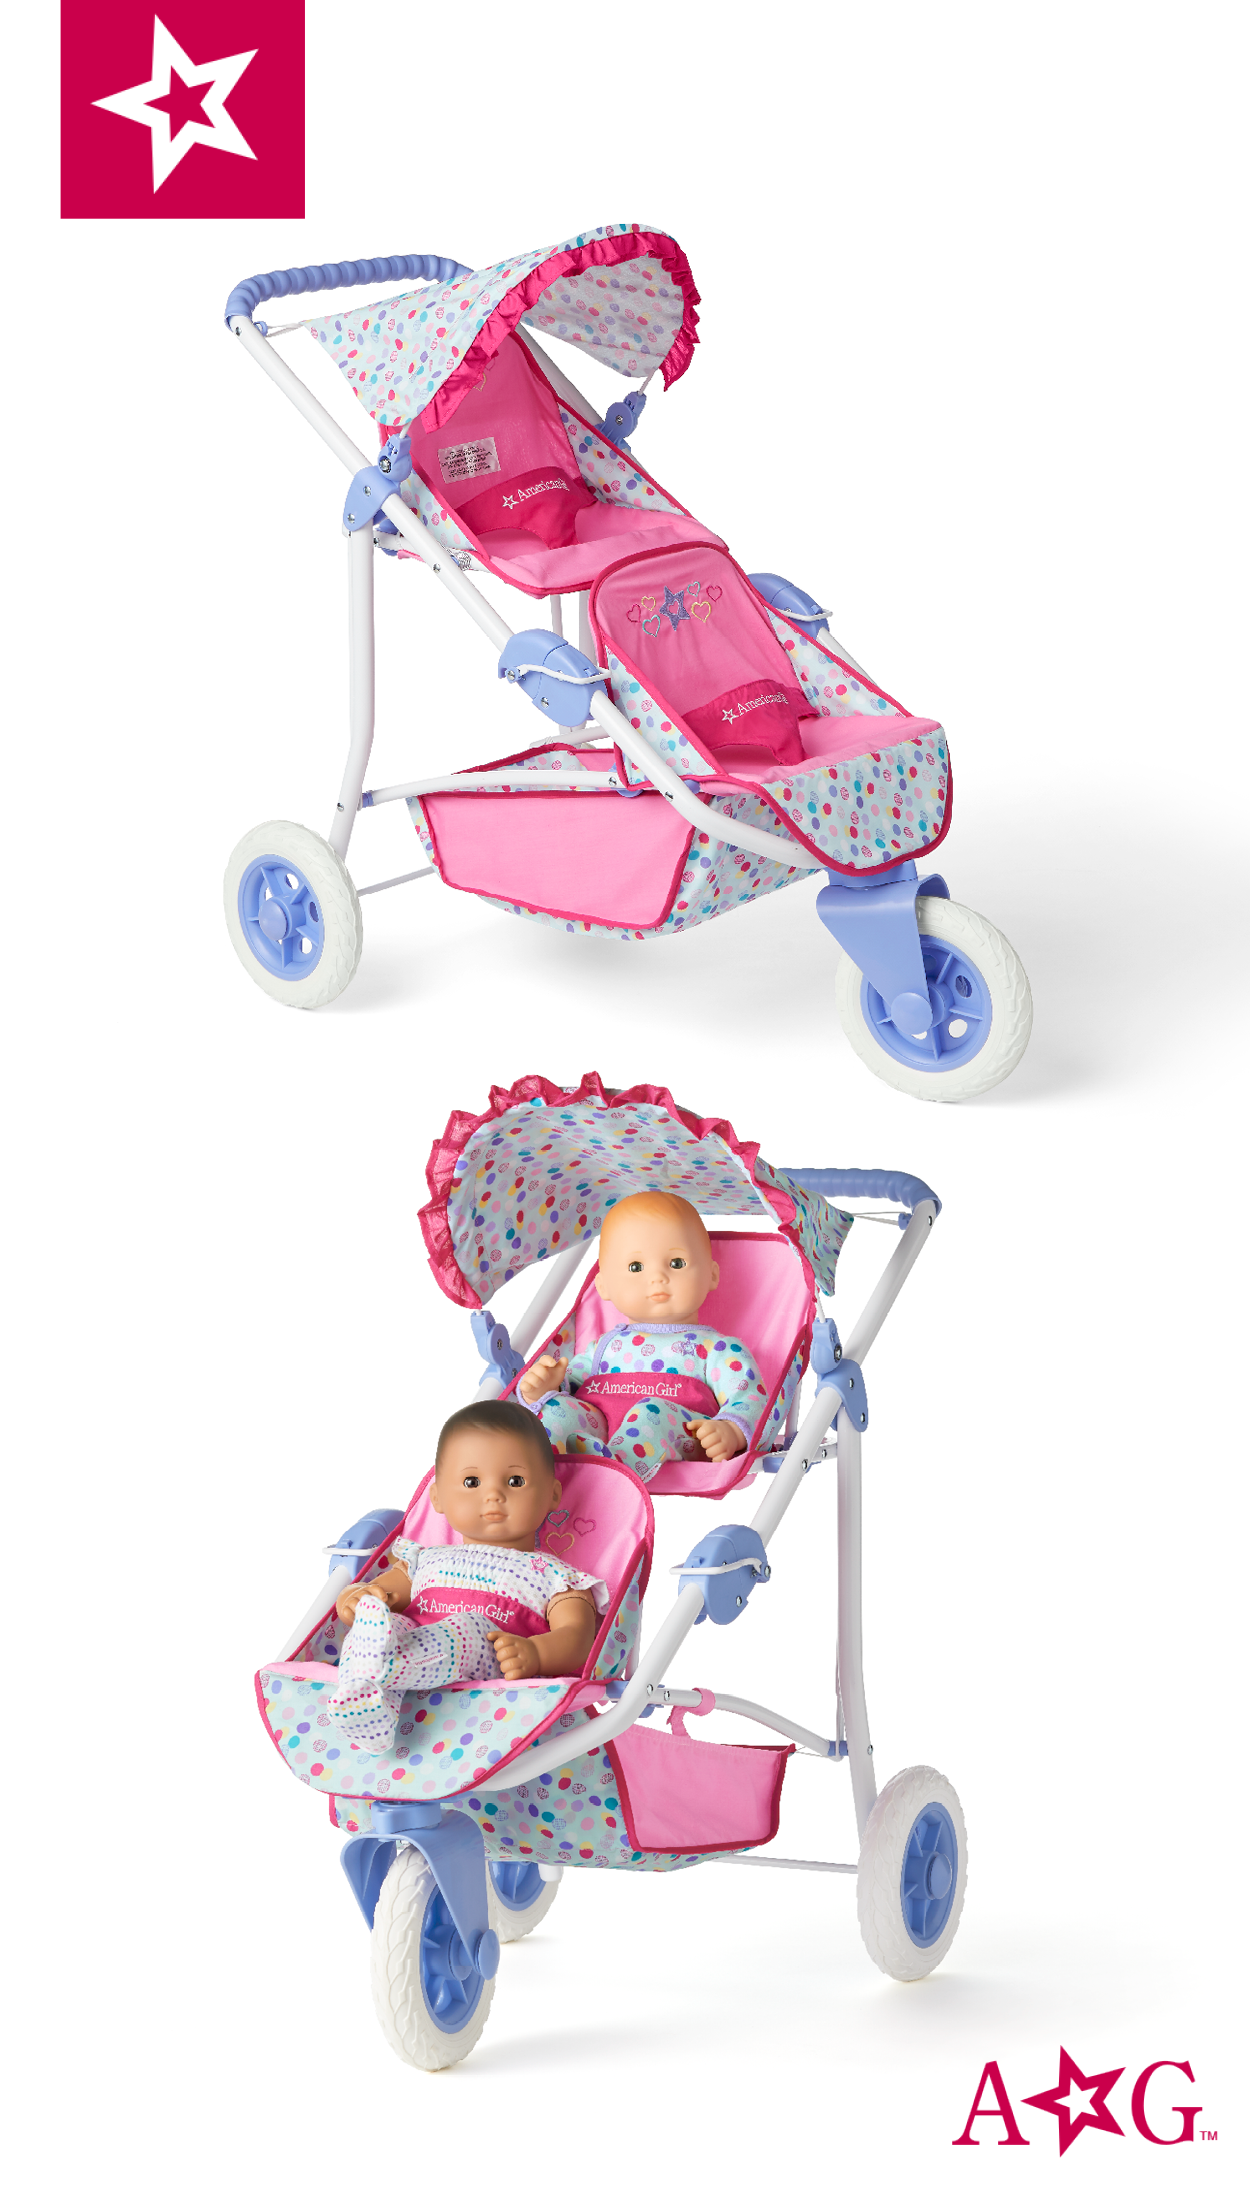 Double Stroller American girl, American girl doll